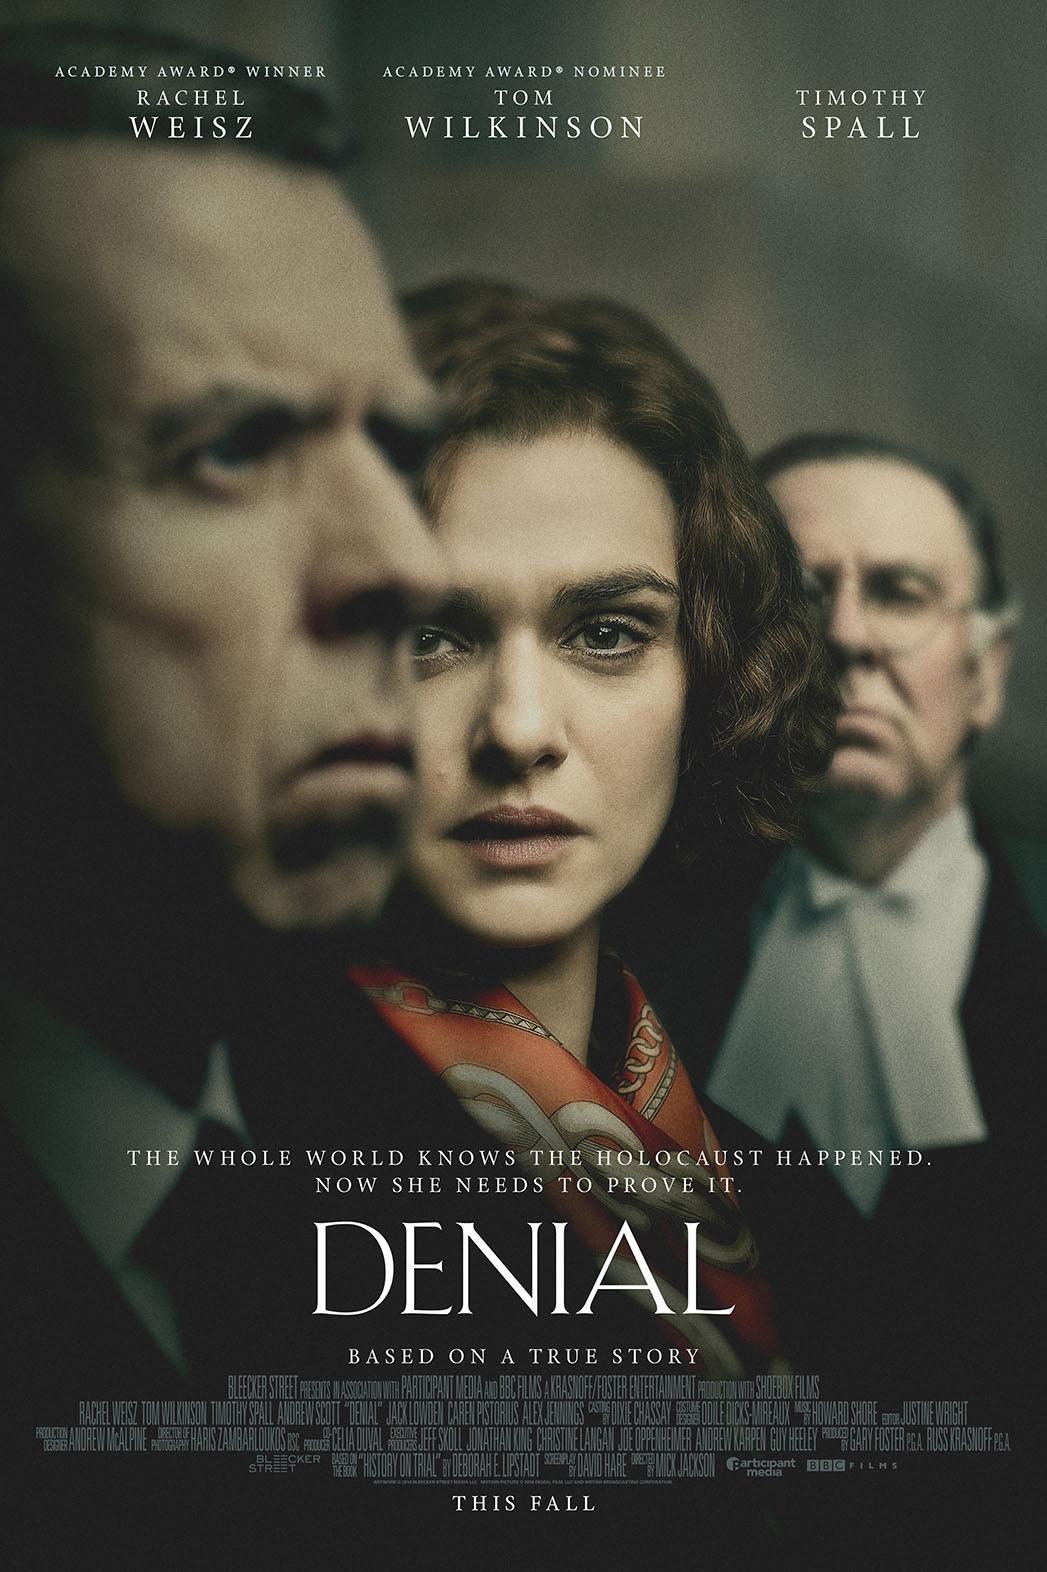 denial_movie_poster_p_2016.jpg